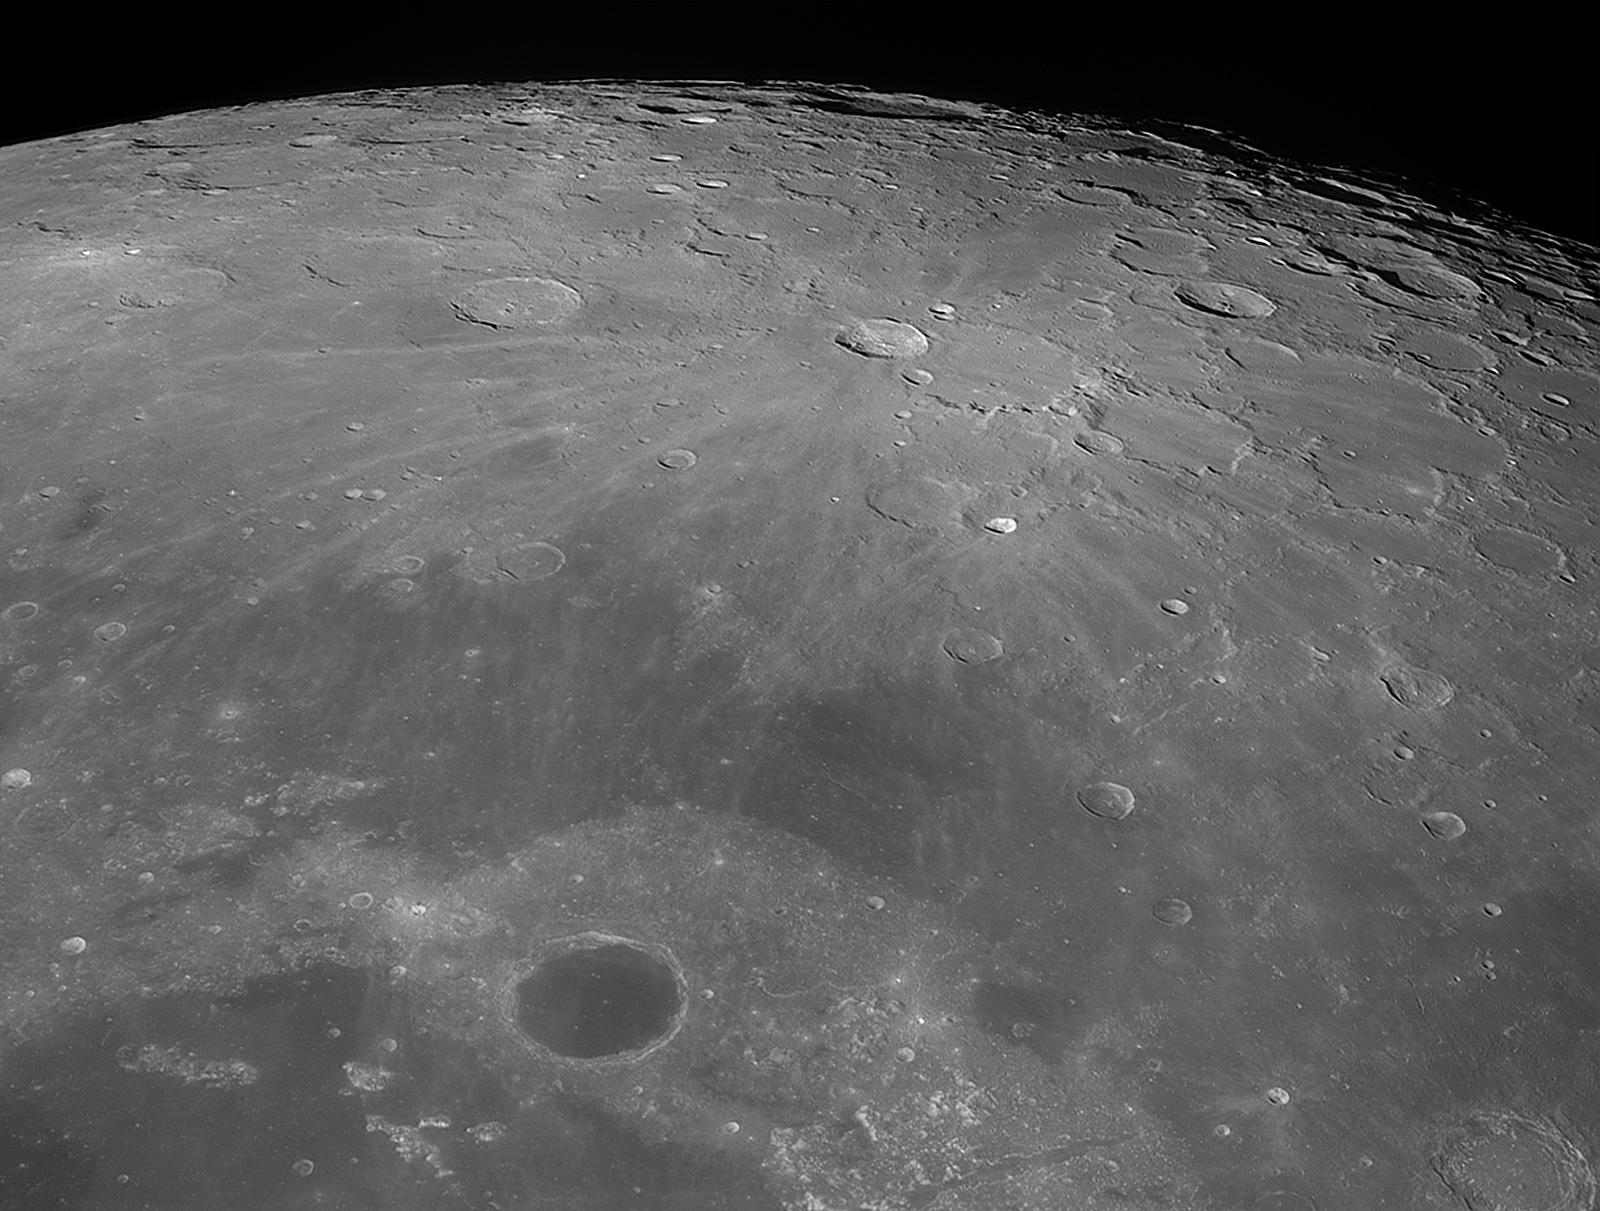 Lune-20200904_Peary-baAS.jpg.c558197b17929a2c0e8a3033f5b83de8.jpg